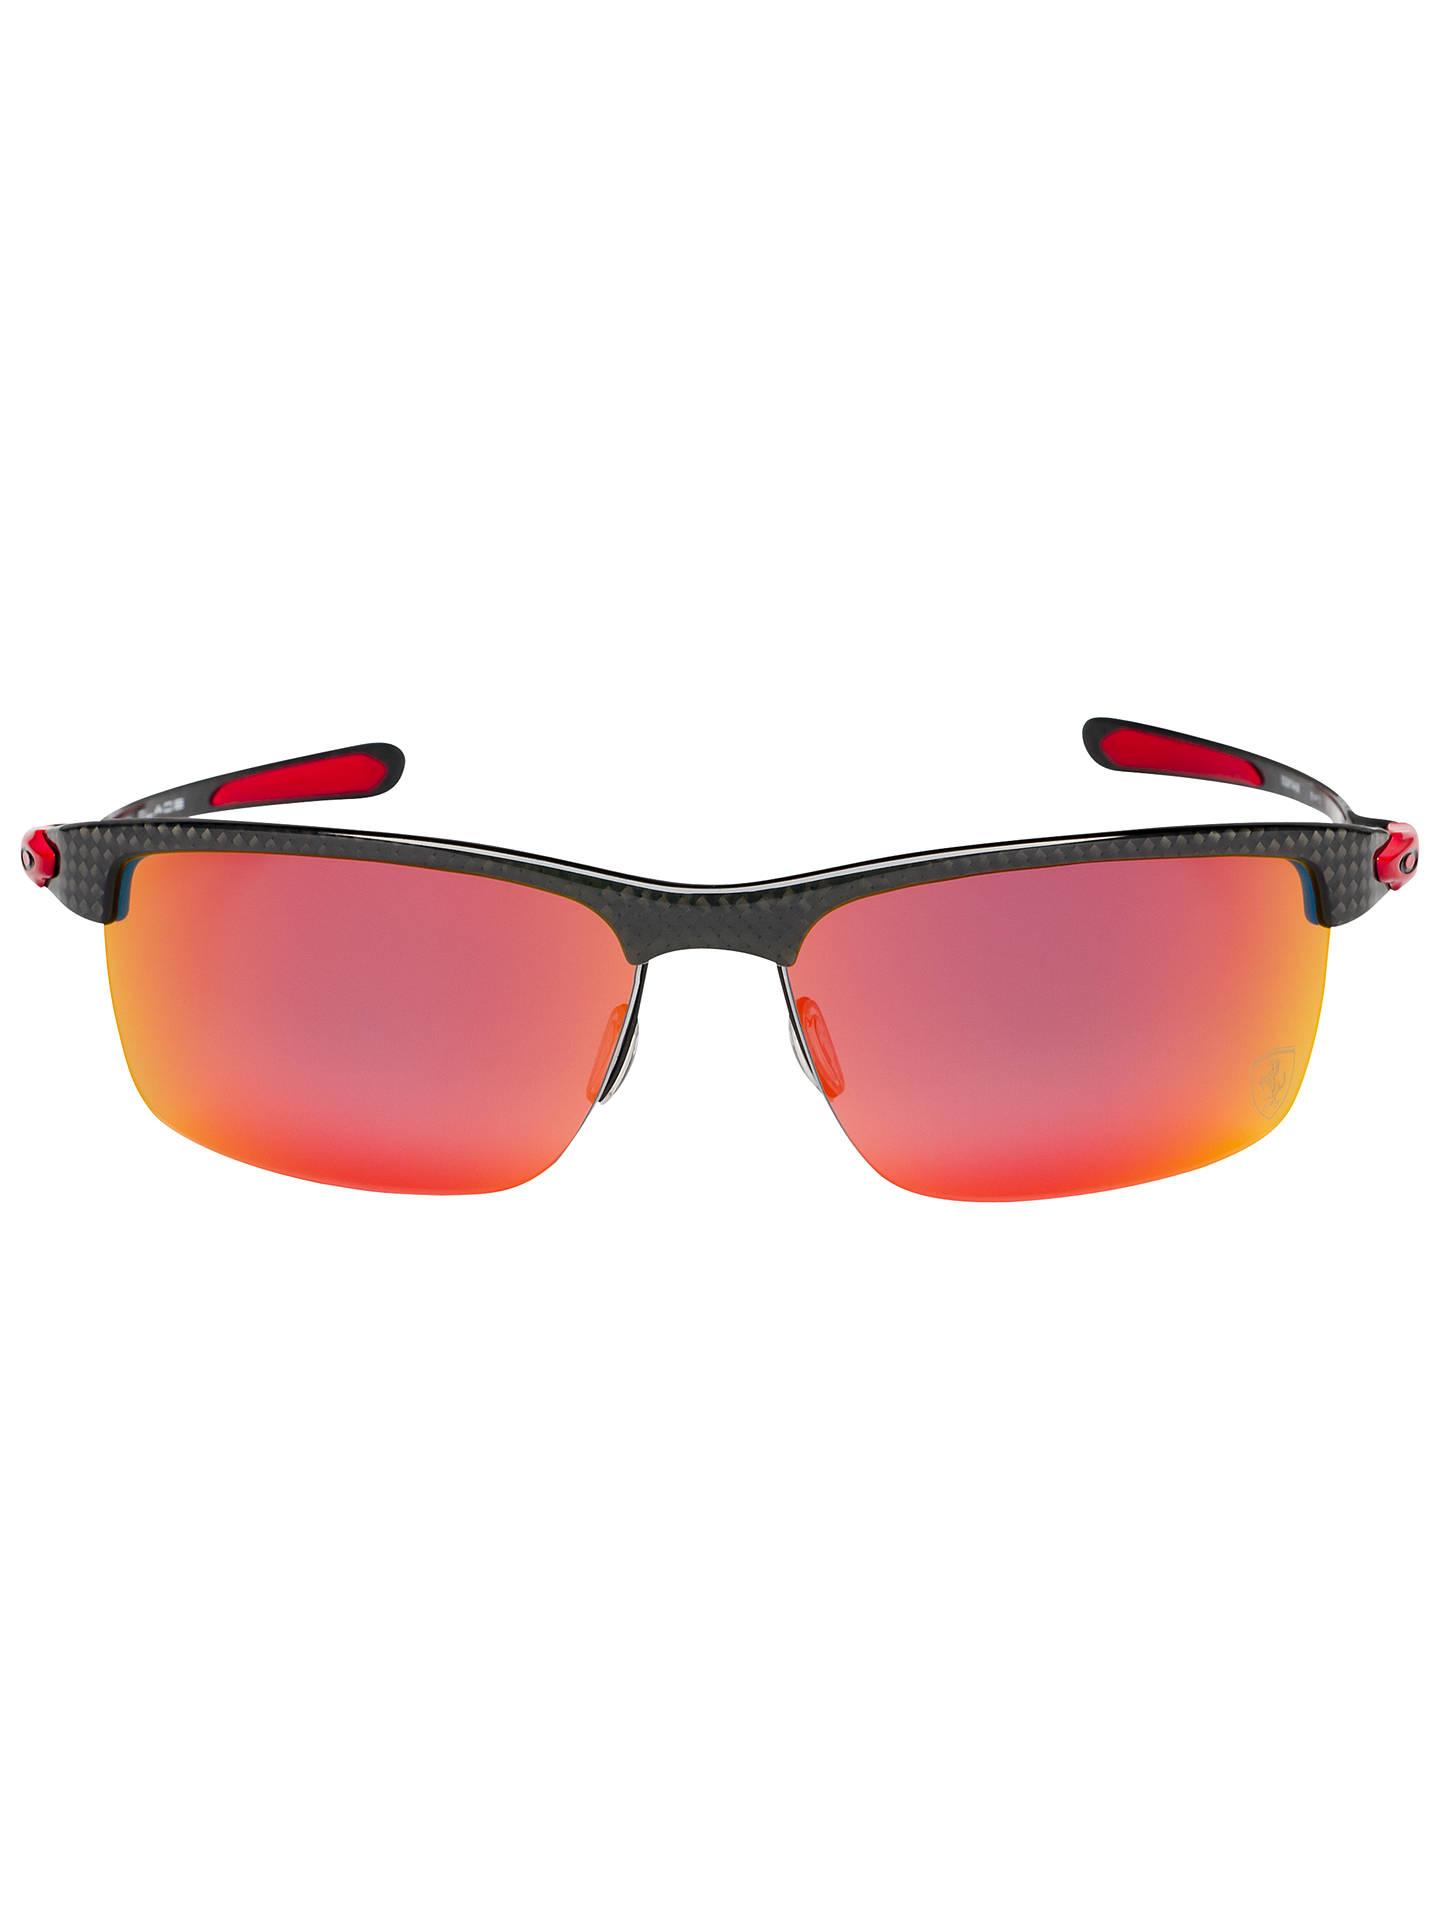 8a4dc0a230b ... Buy Oakley OO9174 Carbon Blade Sunglasses